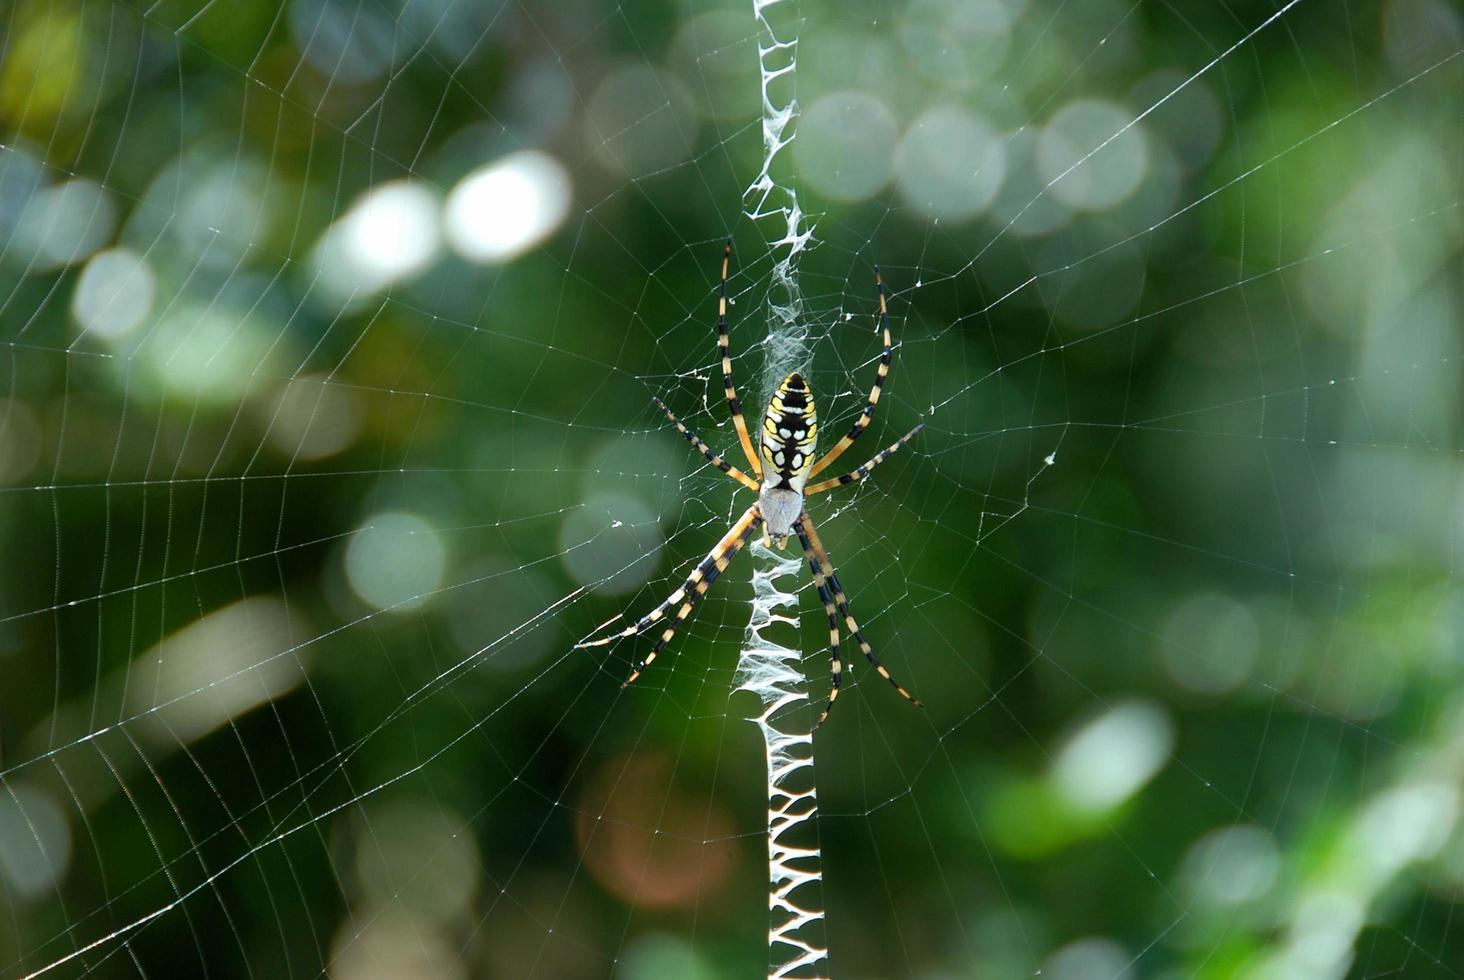 araignée dans le jardin photo